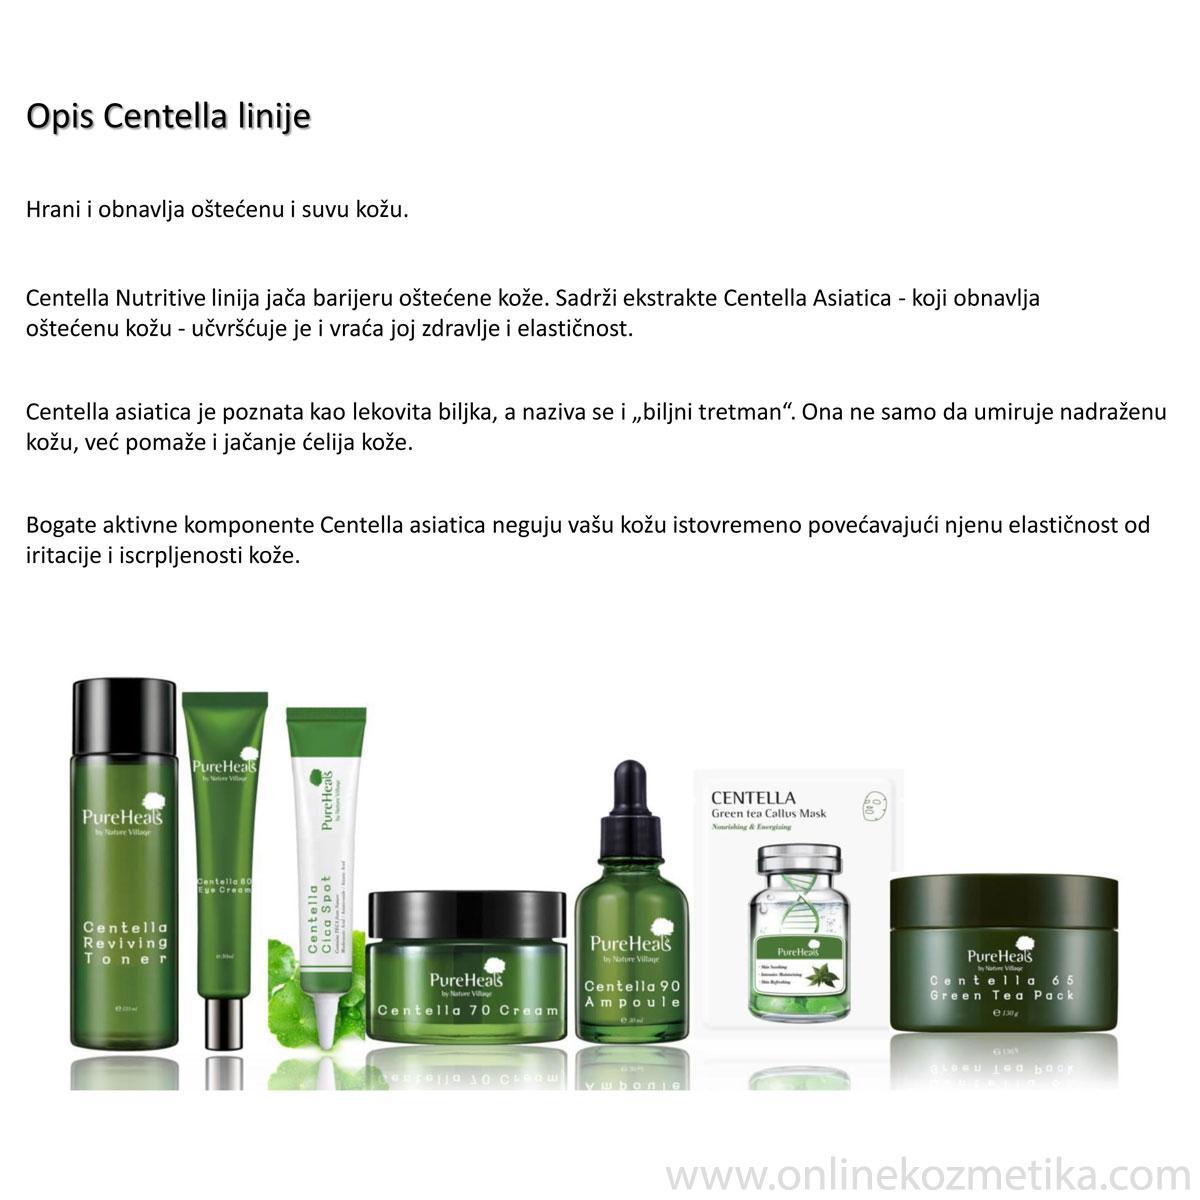 Pureheals Centella Green Tea Callus Mask 25gr